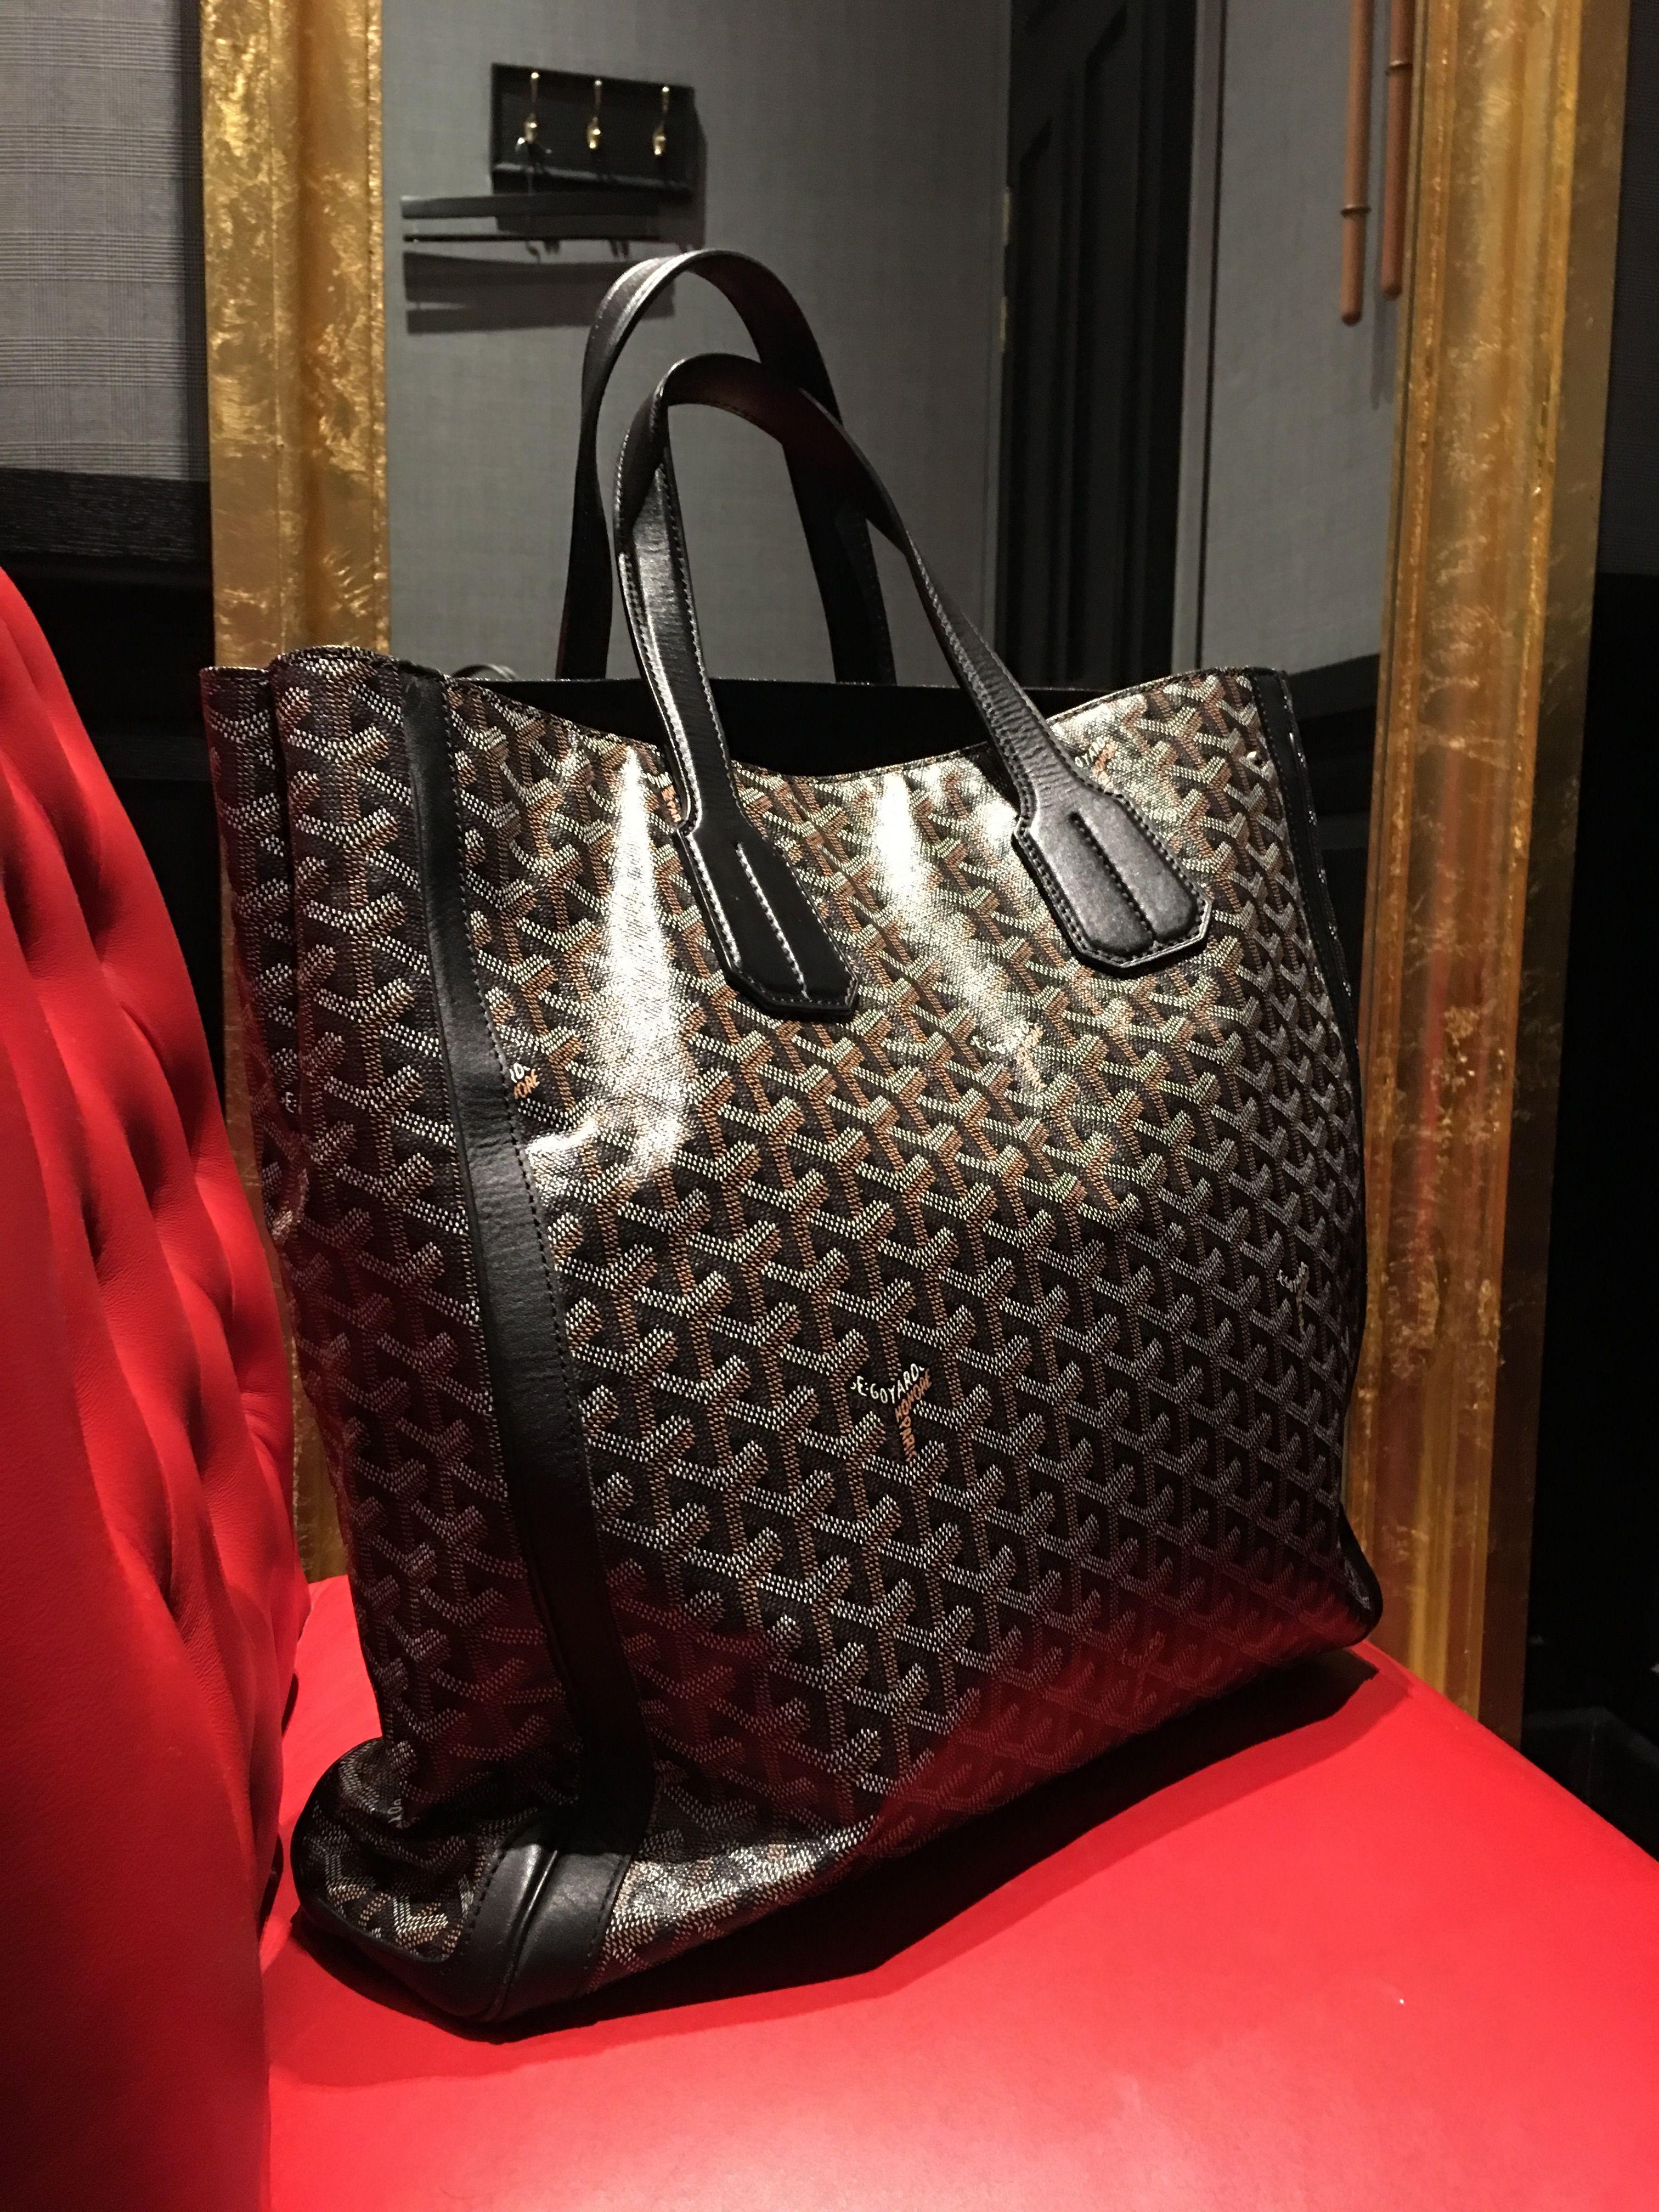 71bba605bb Goyard Voltaire bag | Murse & more... in 2019 | Goyard bag, Bags ...